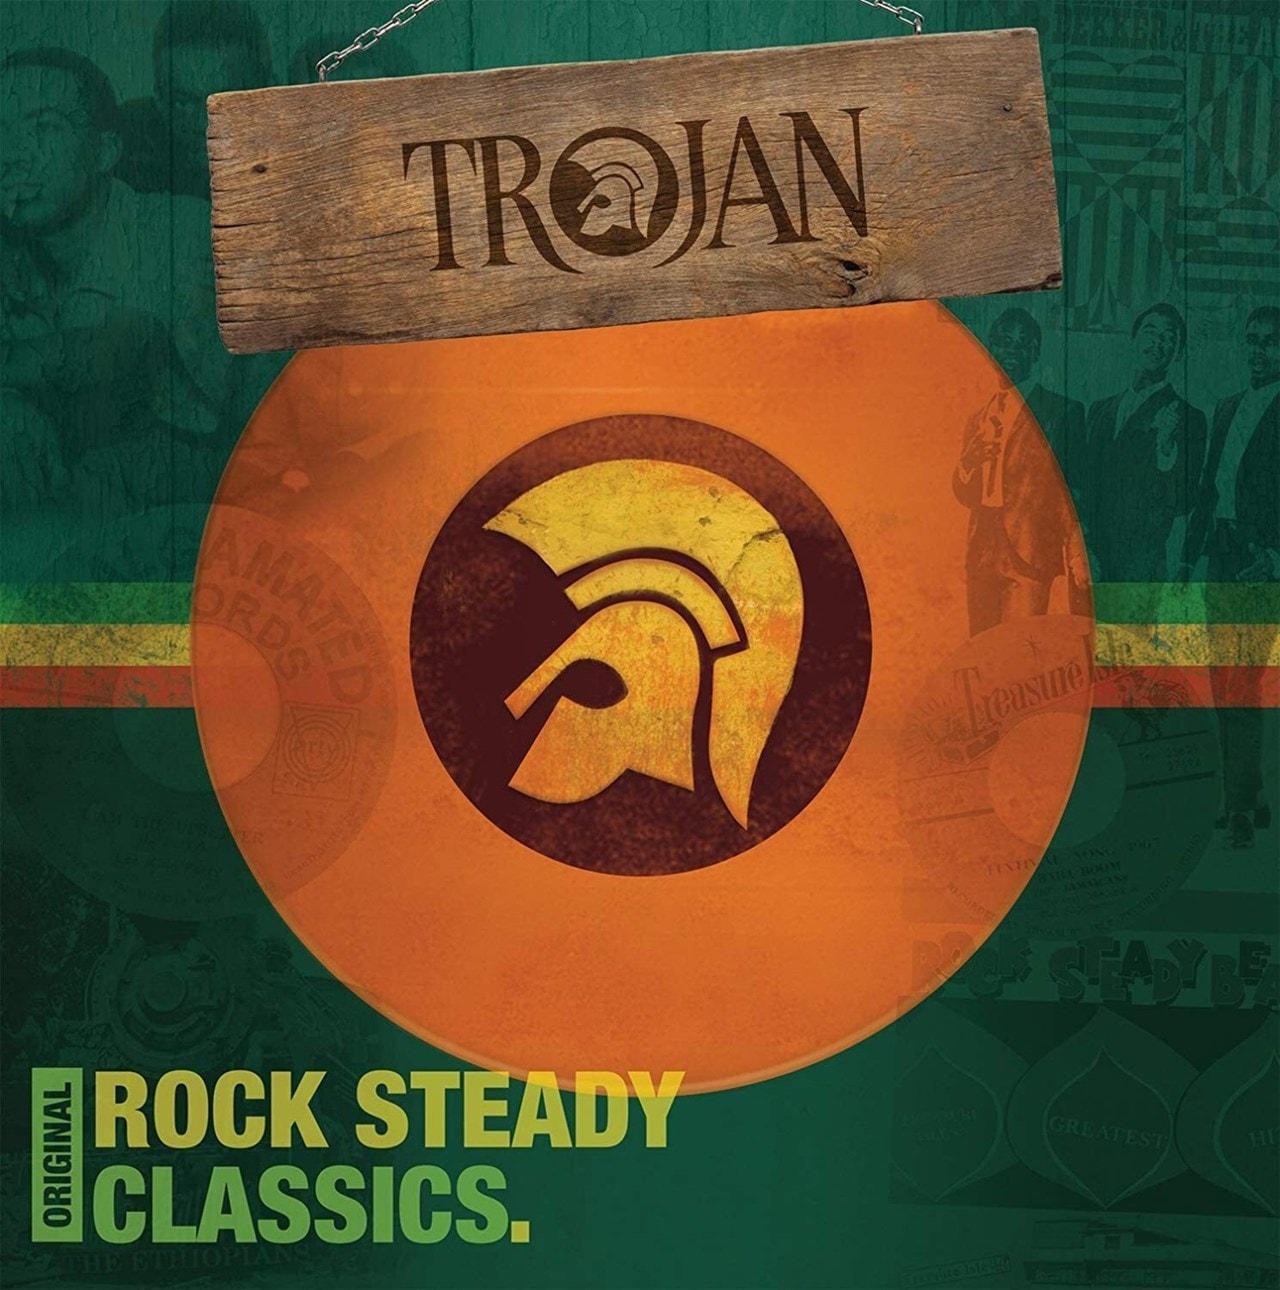 Original Rock Steady Classics - 1